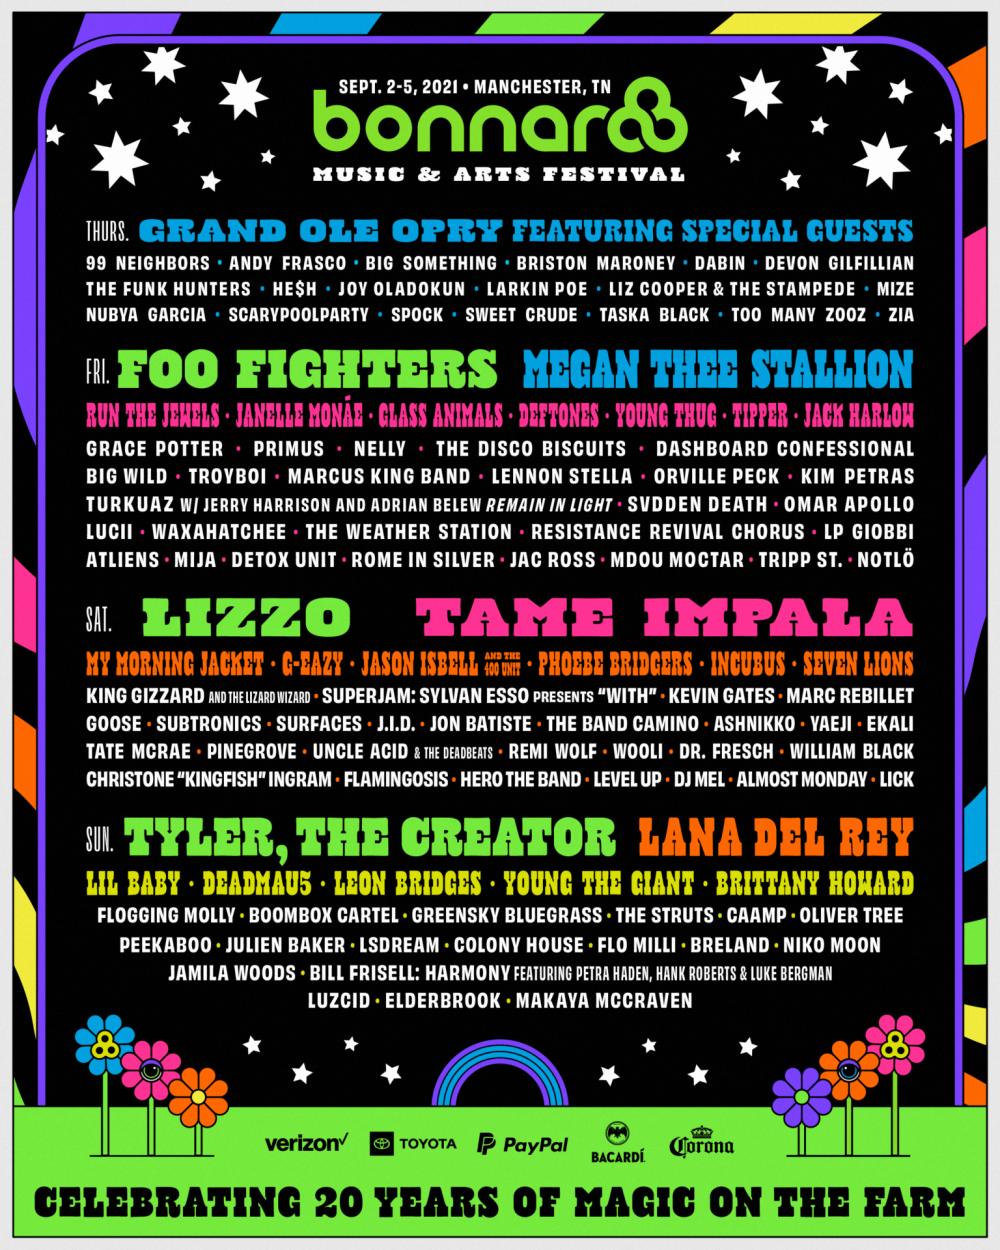 Bonnaroo 2021 poster